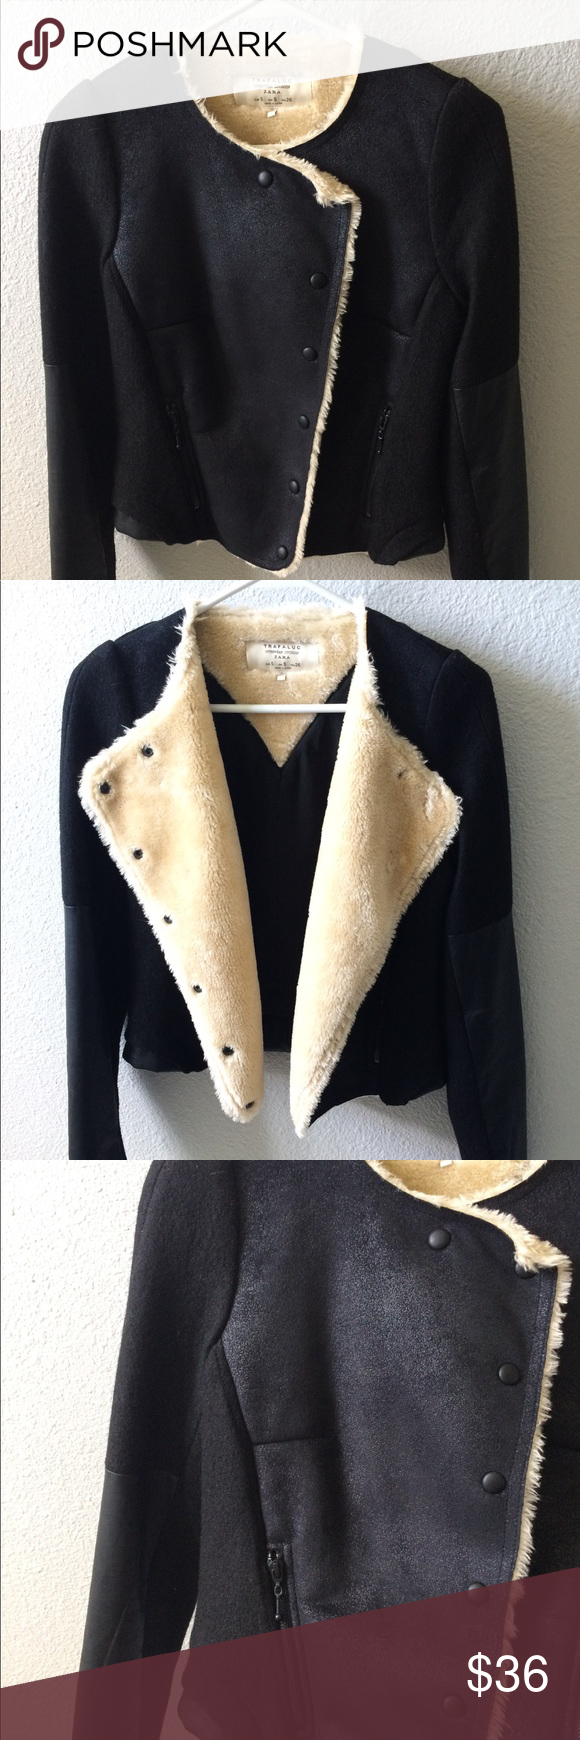 Zara Trafaluc Outerwear Division Jacket Fall Winter Jacket Zara Outerwear [ 1740 x 580 Pixel ]